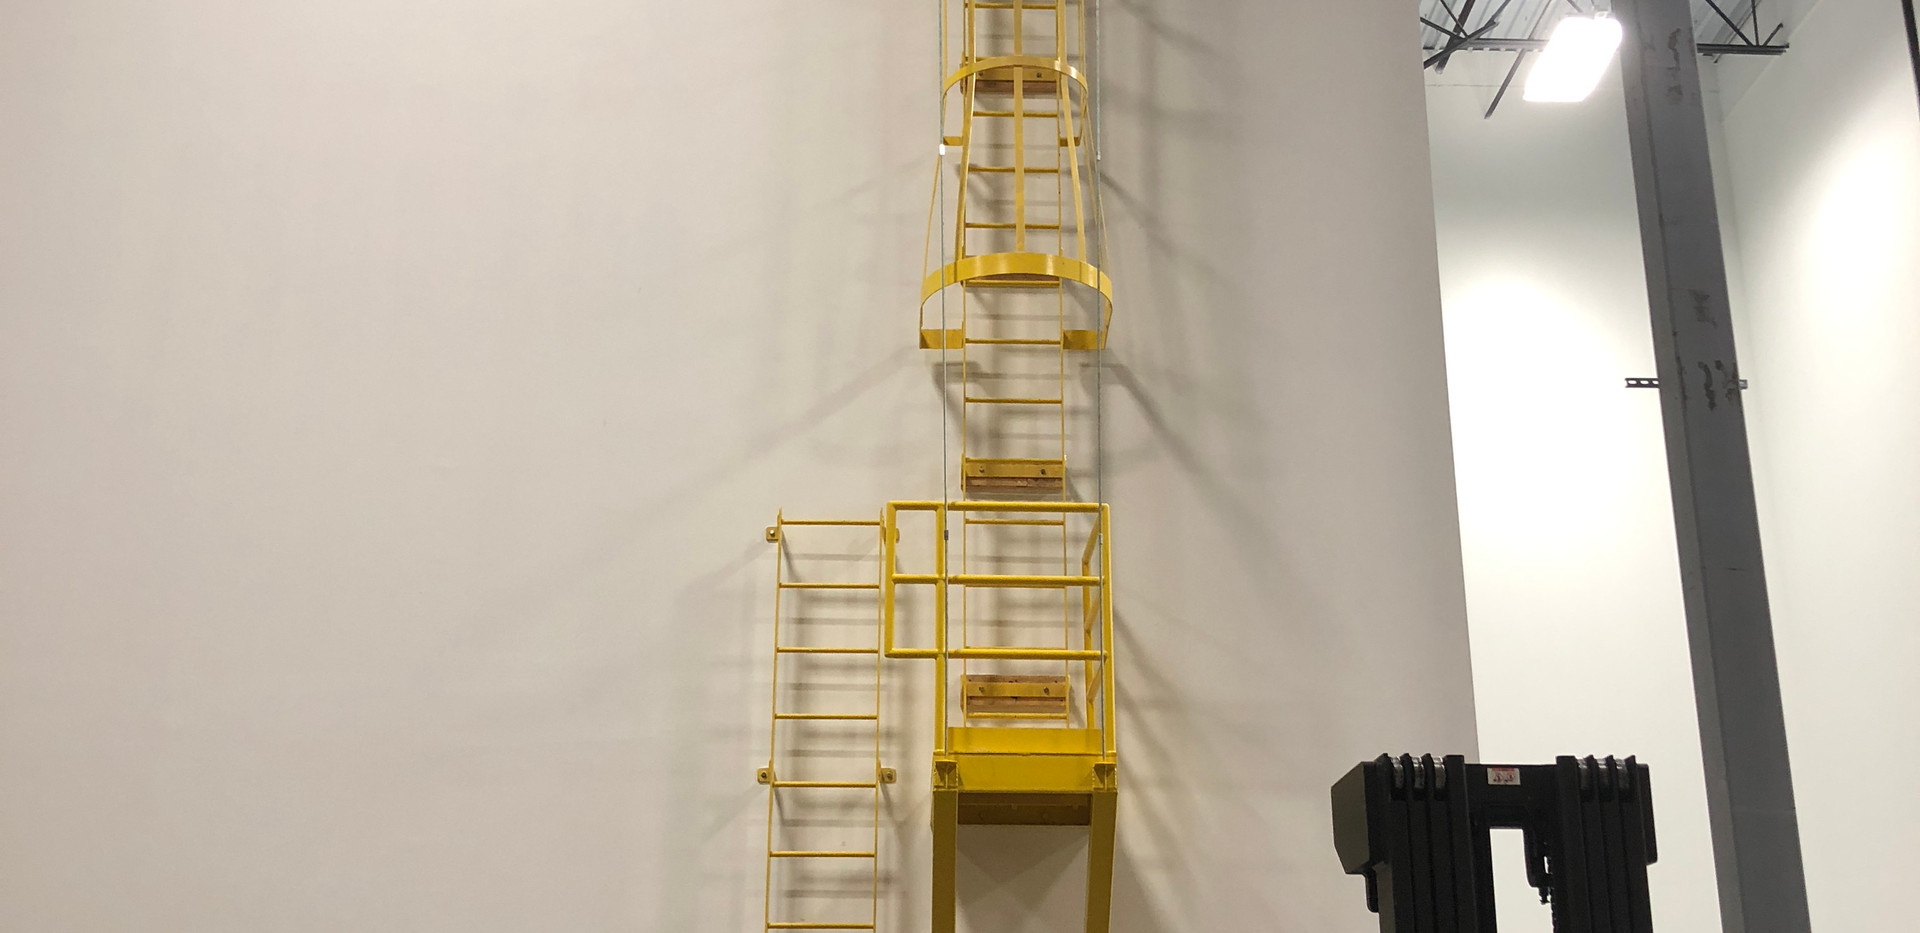 Becknell Industrial Roof Access Ladder.j